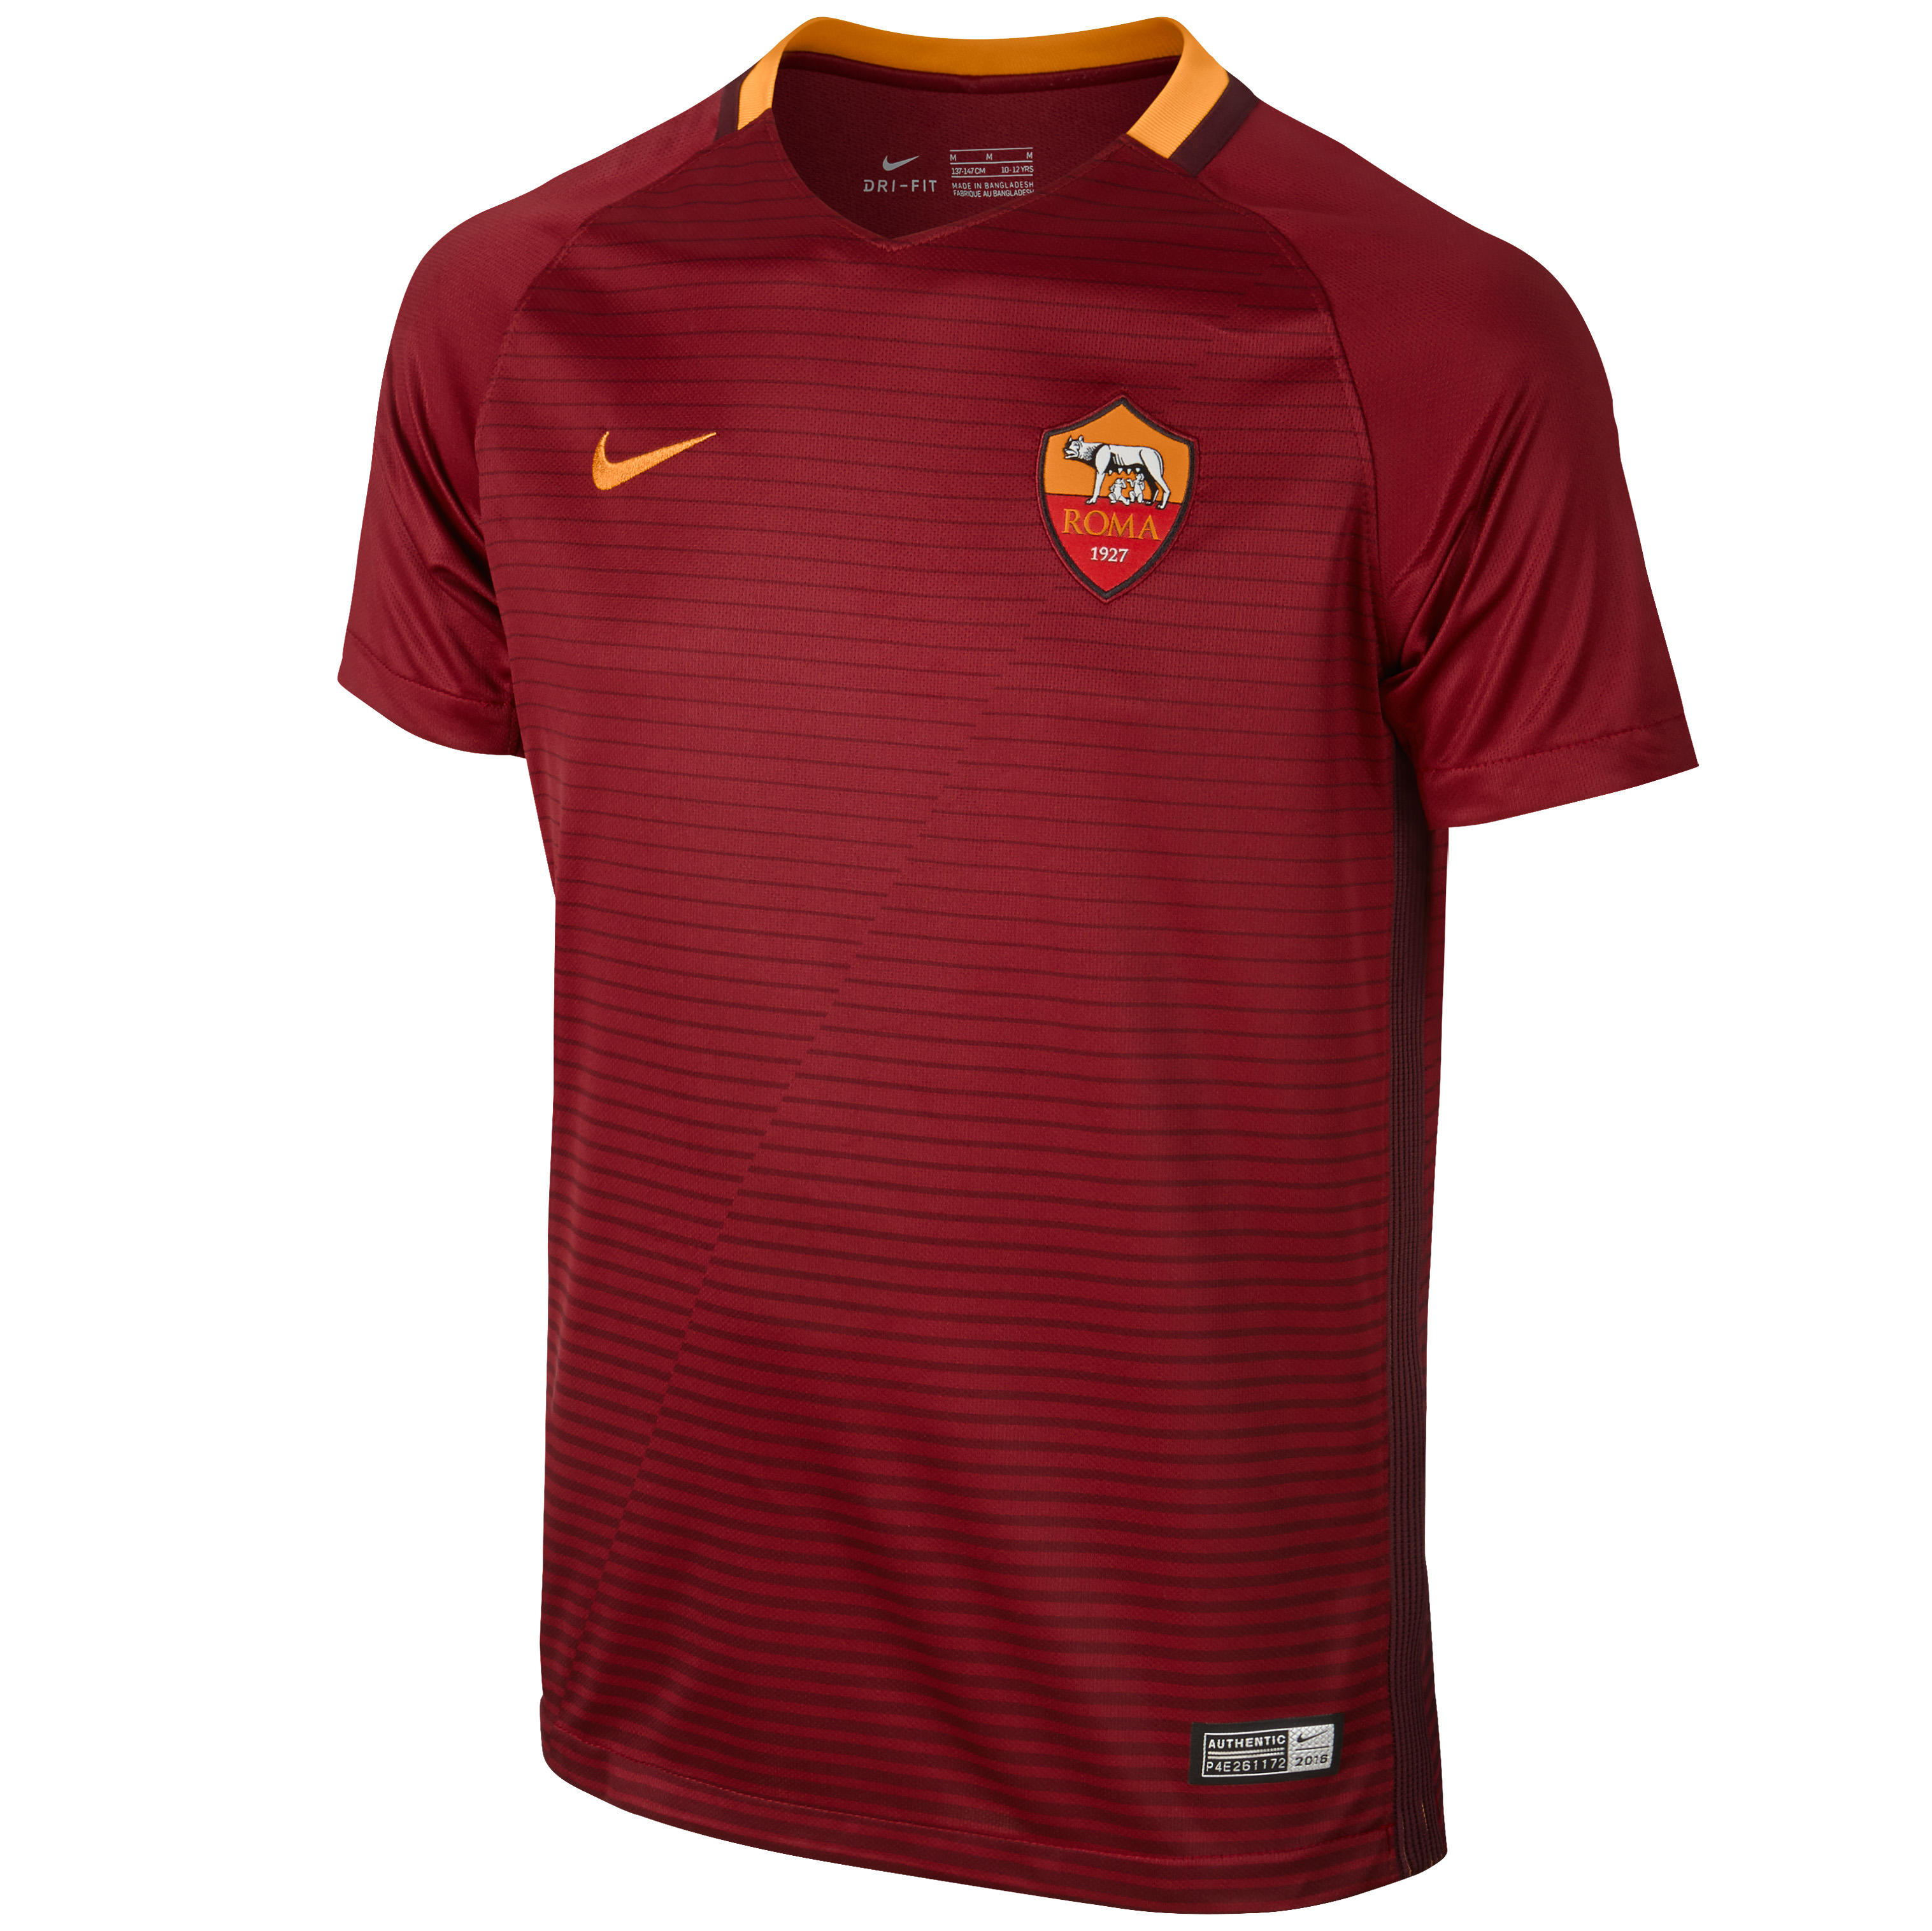 Nike Voetbalshirt AS Roma thuisshirt voor kinderen rood